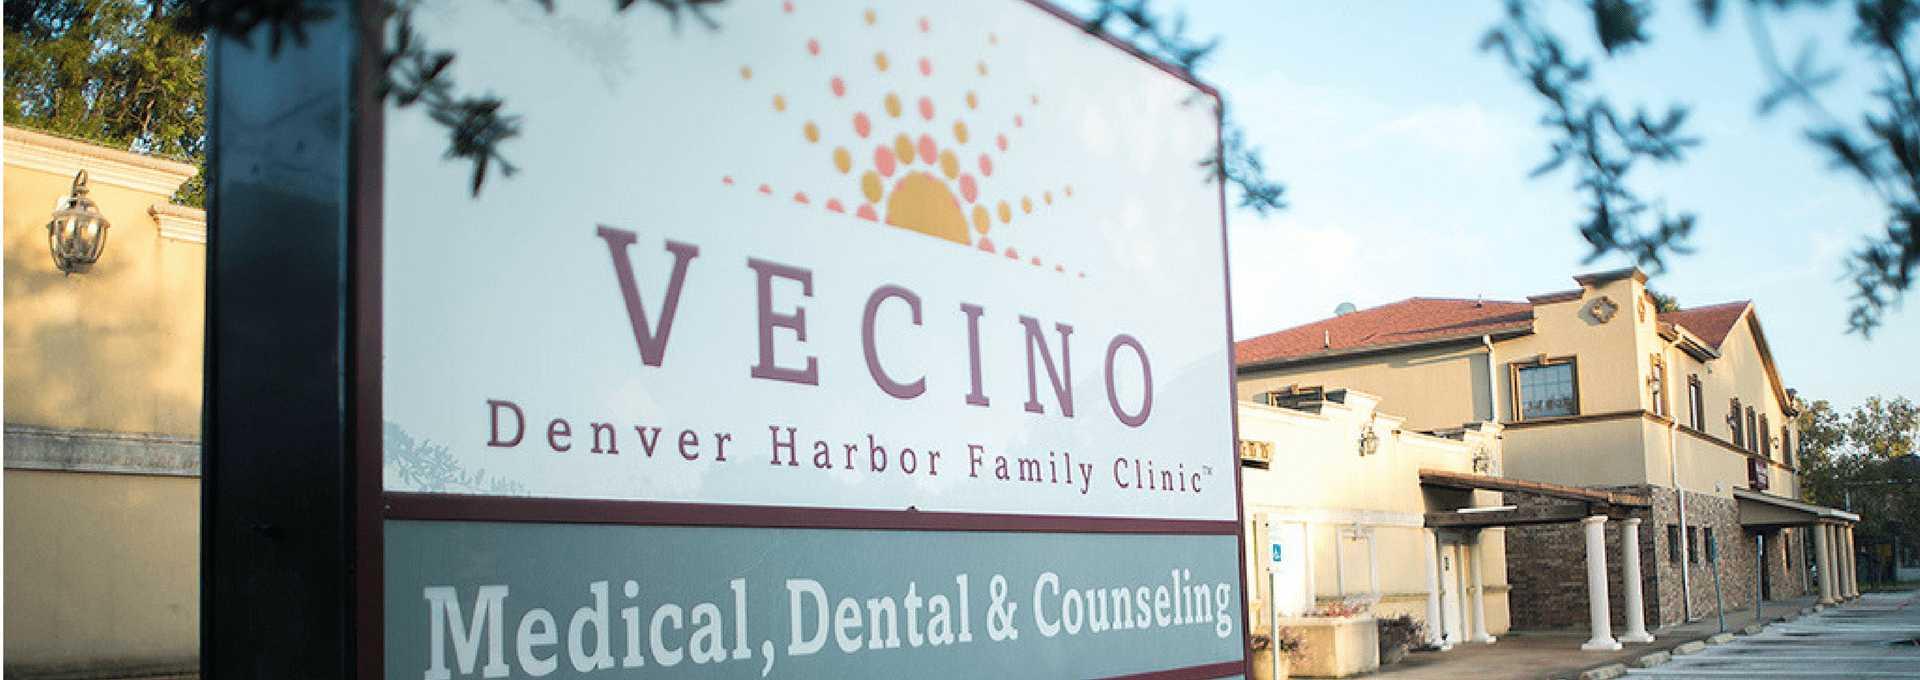 Denver Harbor Clinic